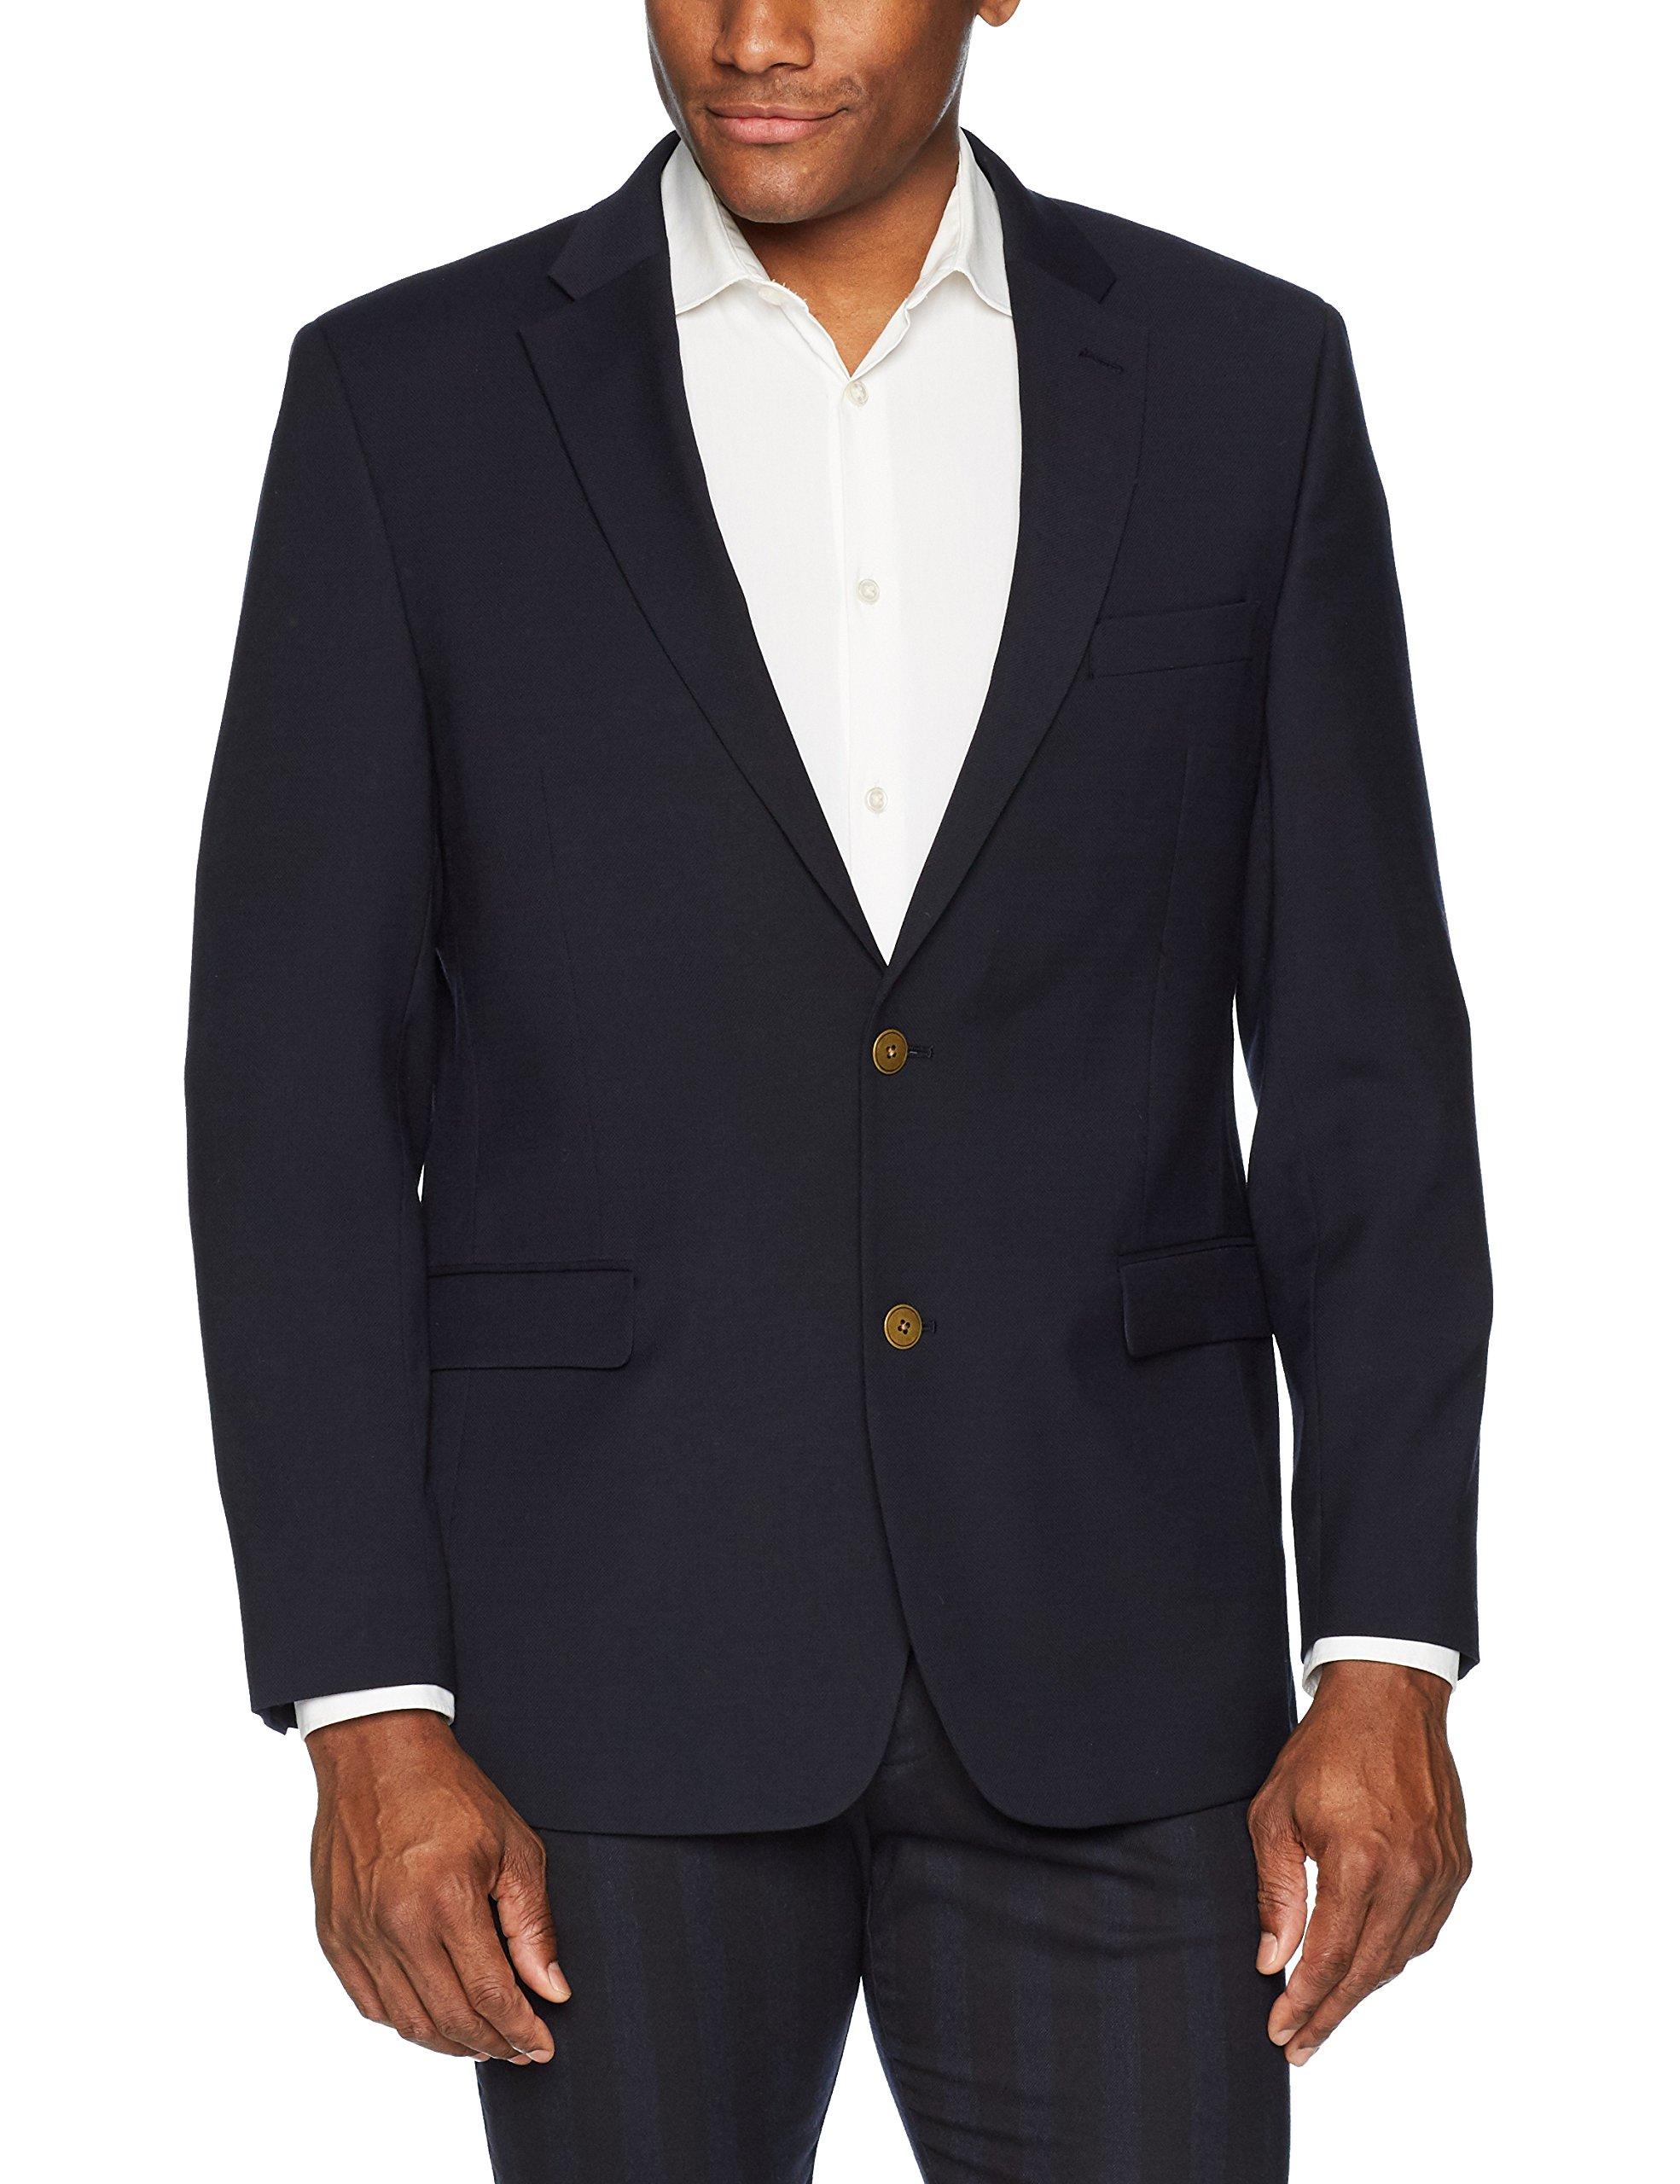 Tommy Hilfiger Men's Modern Fit Stretch Comfort Blazer, Dark Navy Weave, 46 Long by Tommy Hilfiger